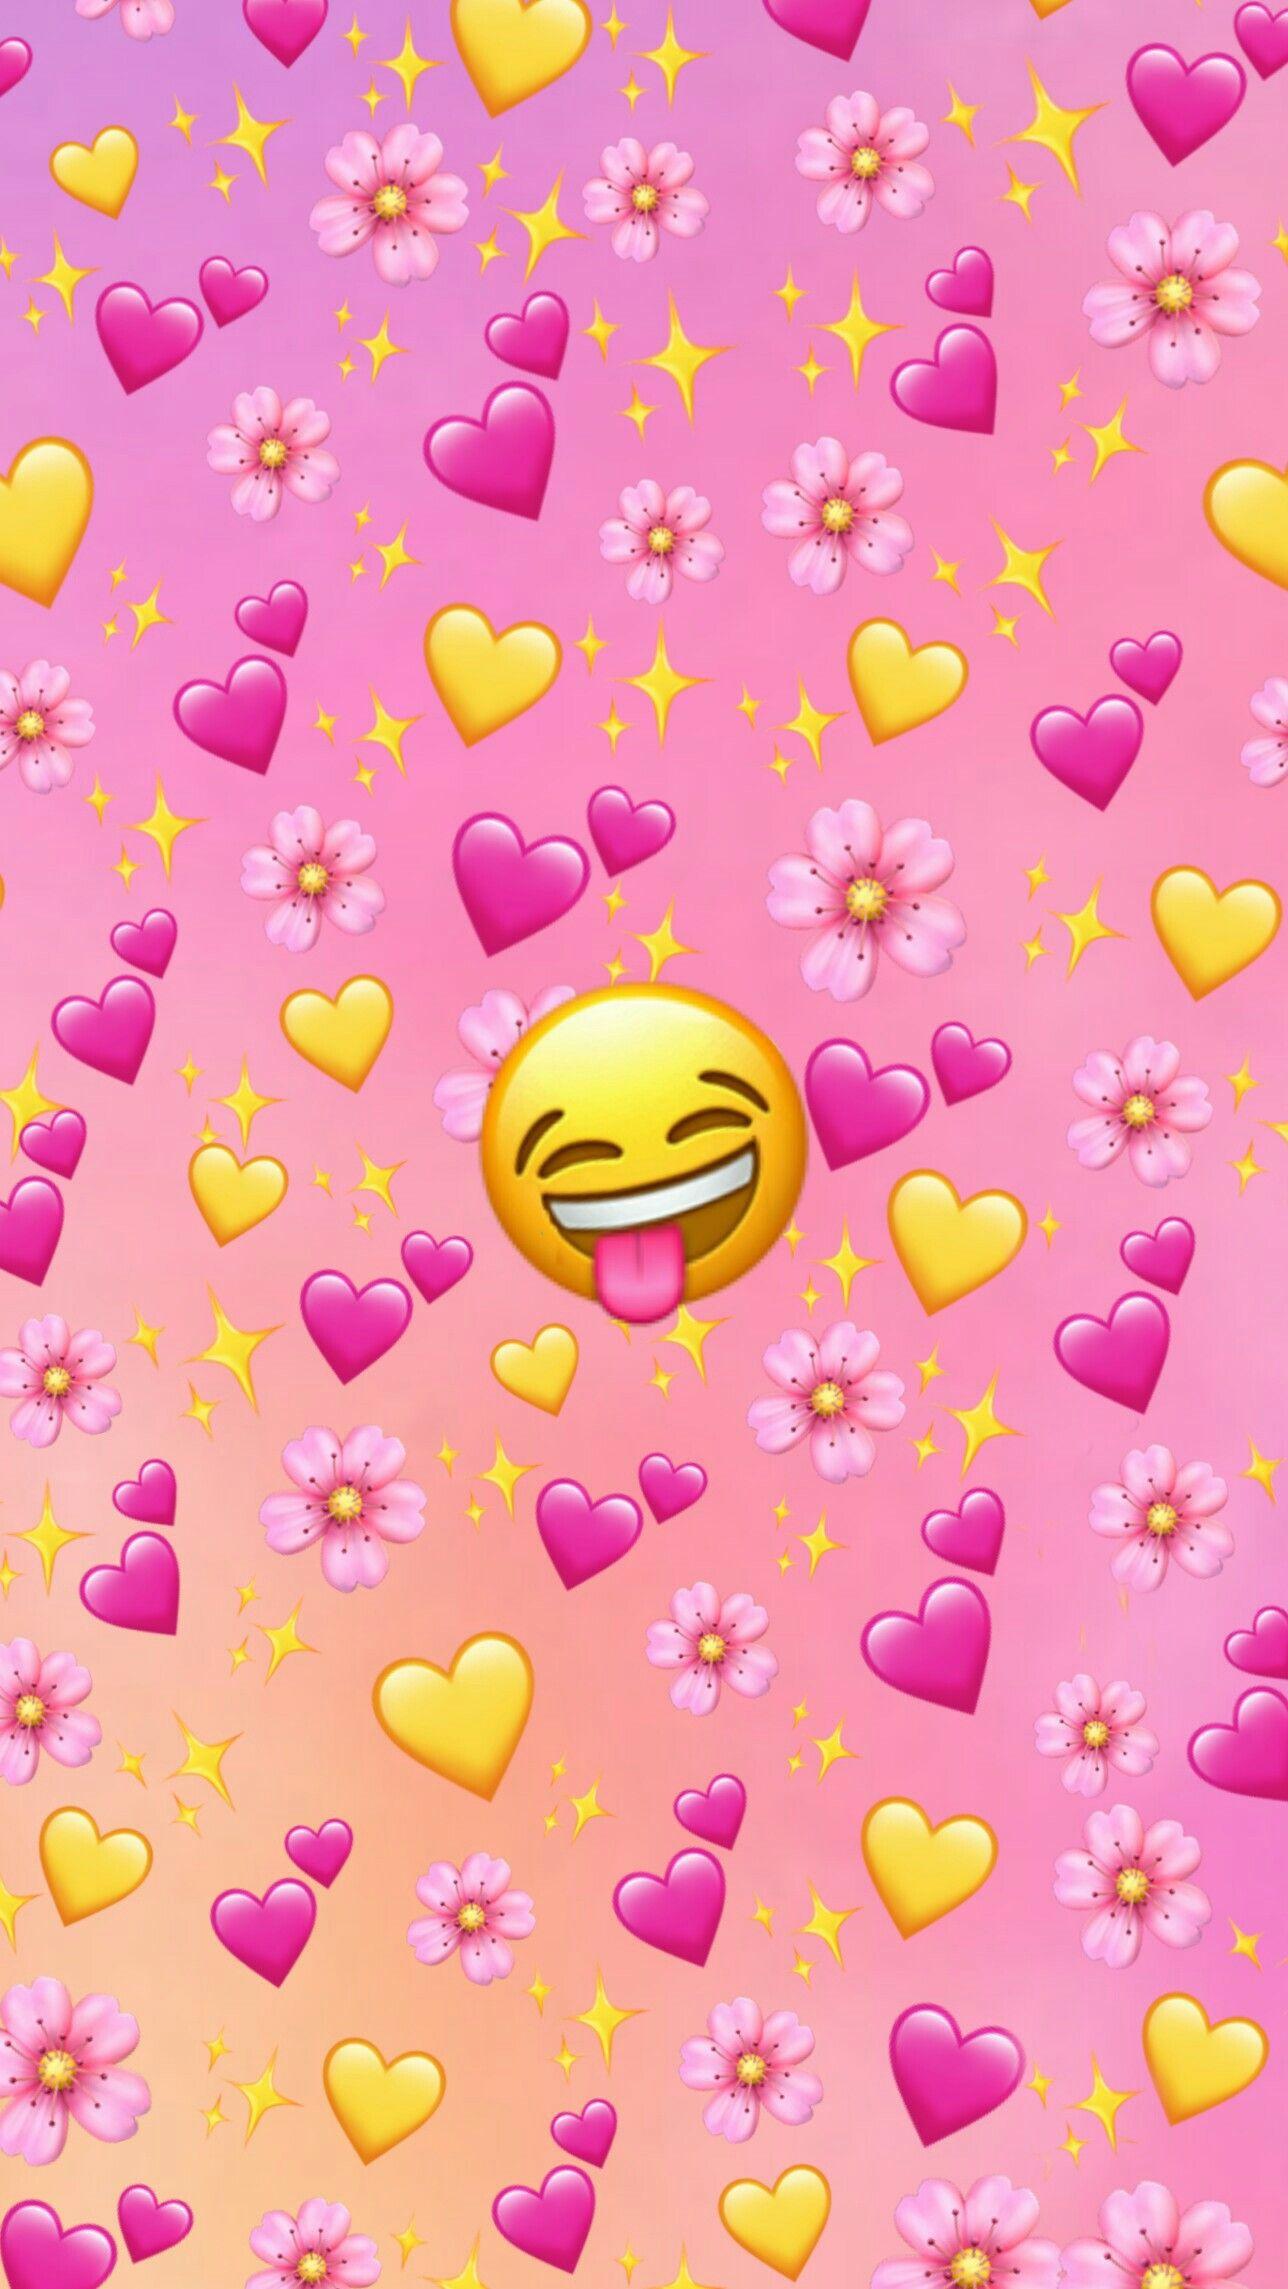 Pink Emoji Background Emoji Backgrounds Emoji Wallpaper Iphone Wallpaper Tumblr Aesthetic